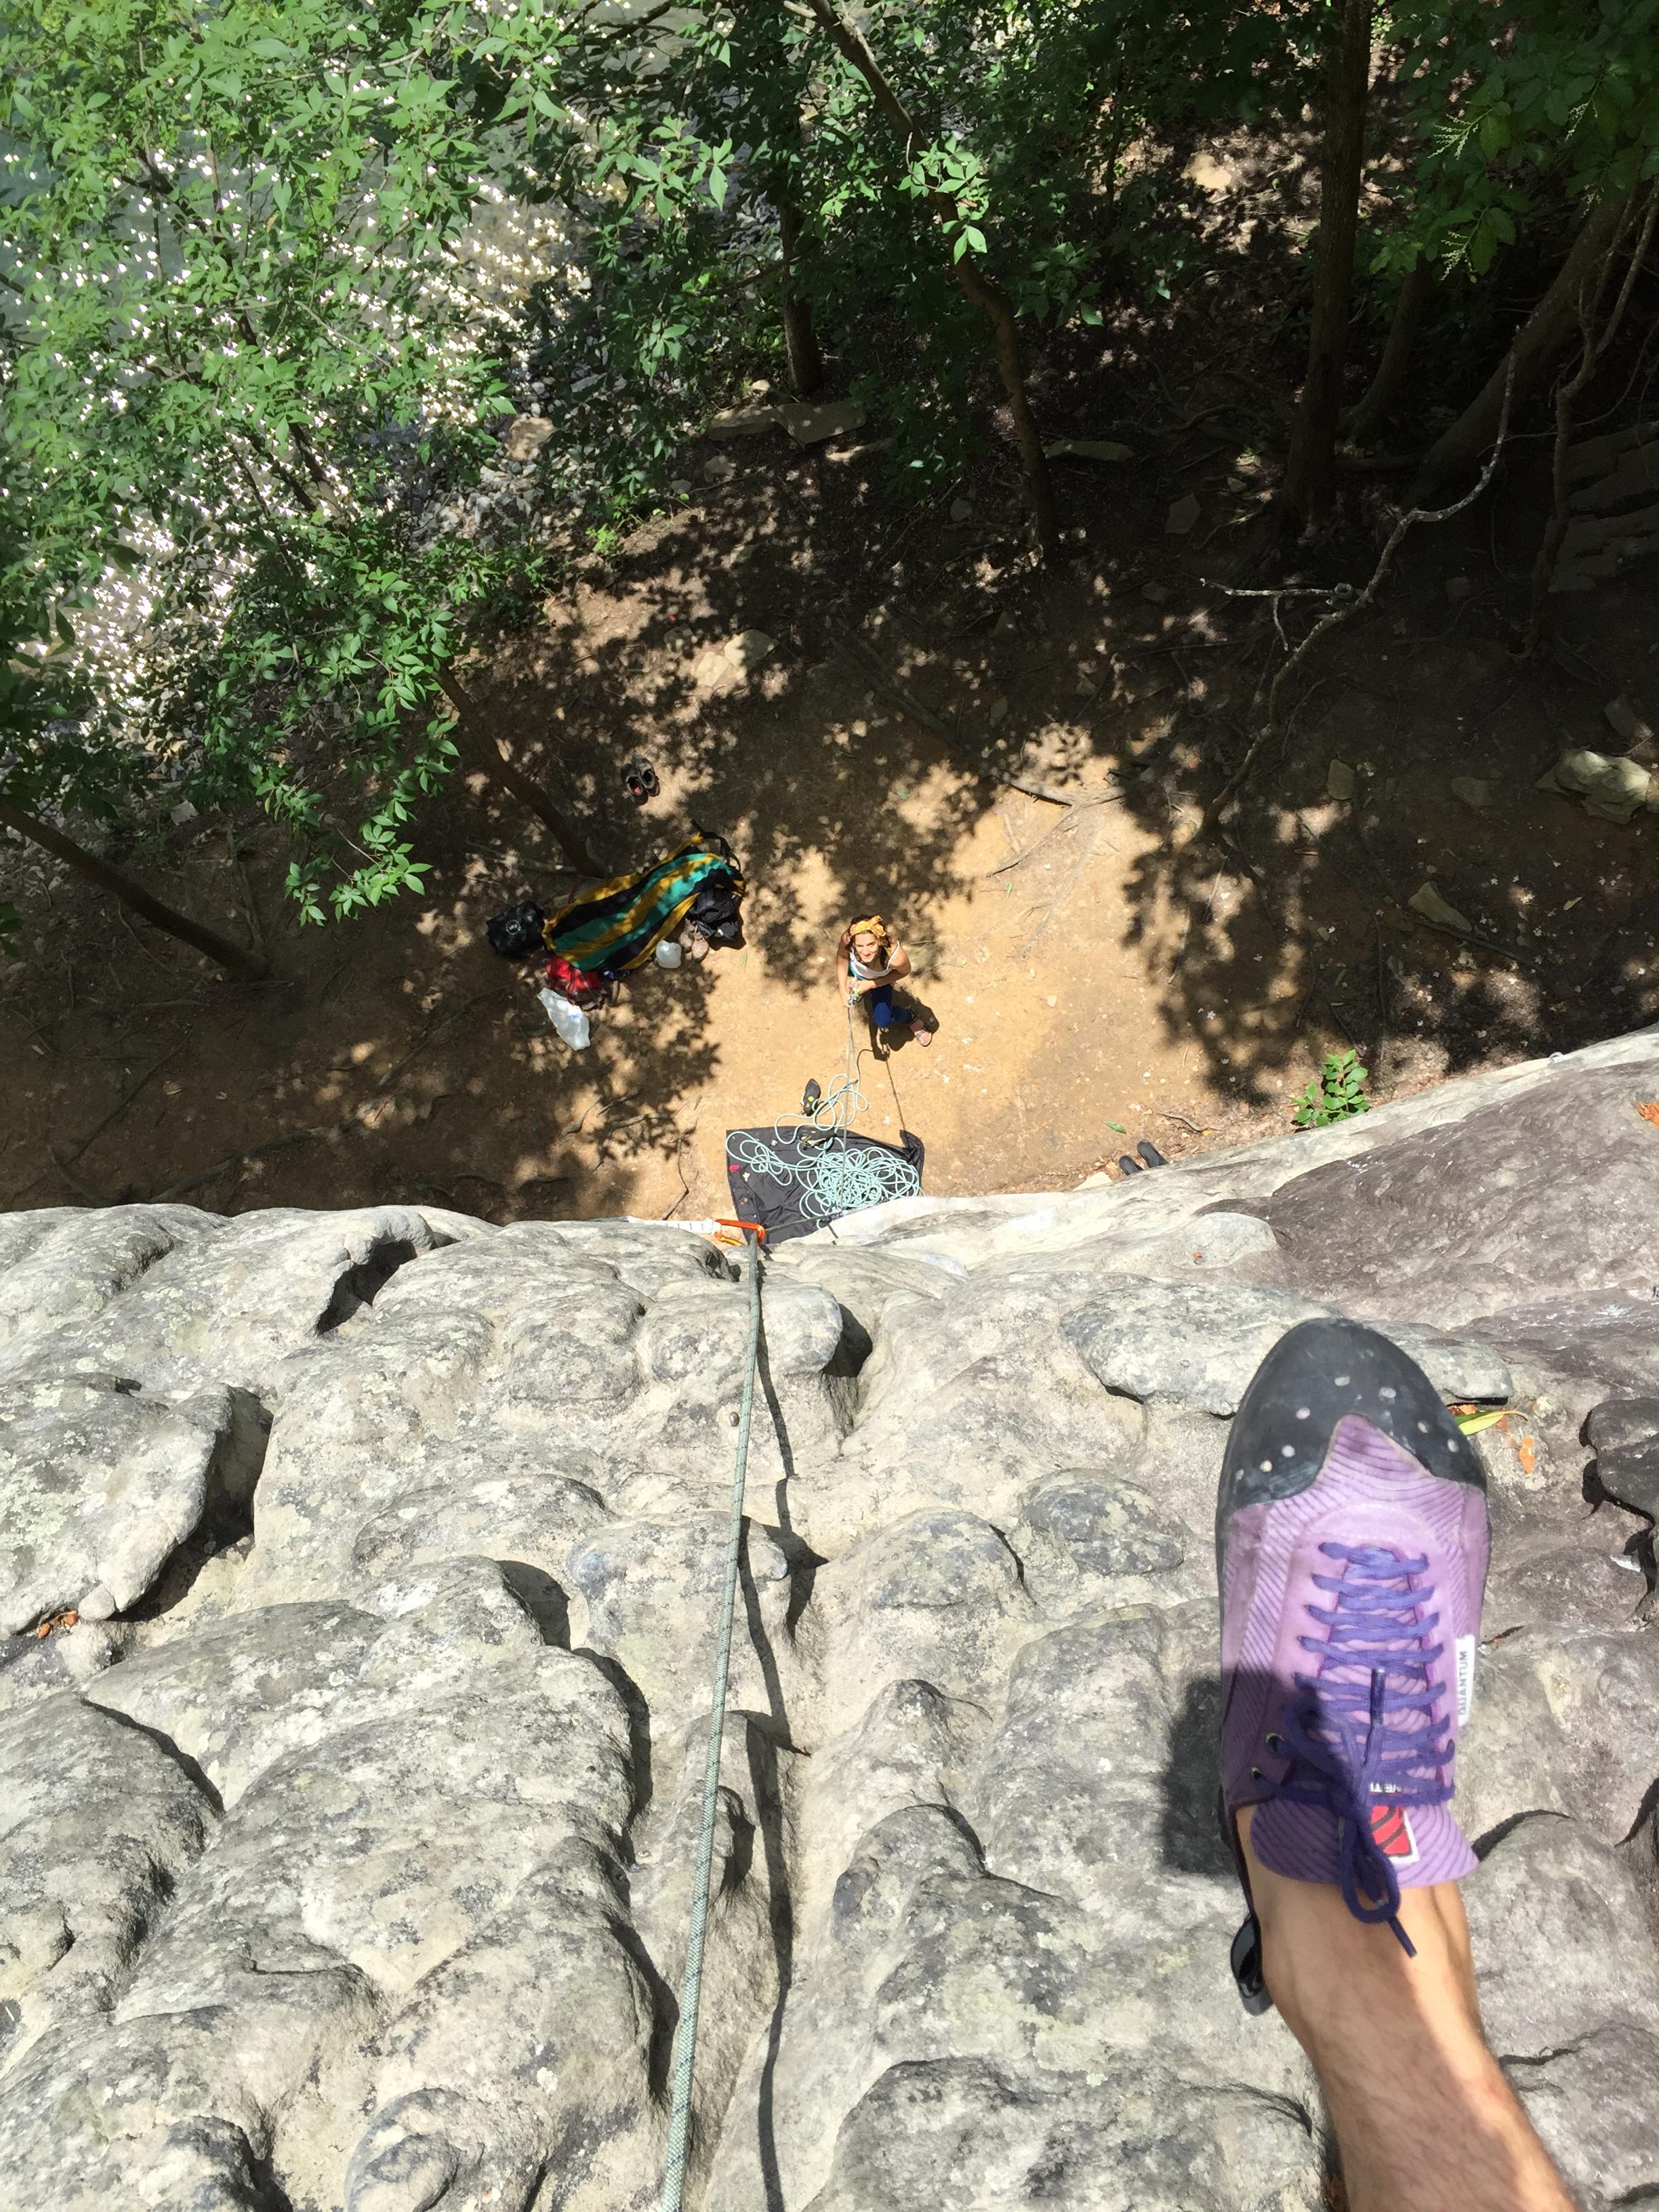 Summersville: Climbing Orange Oswald Wall